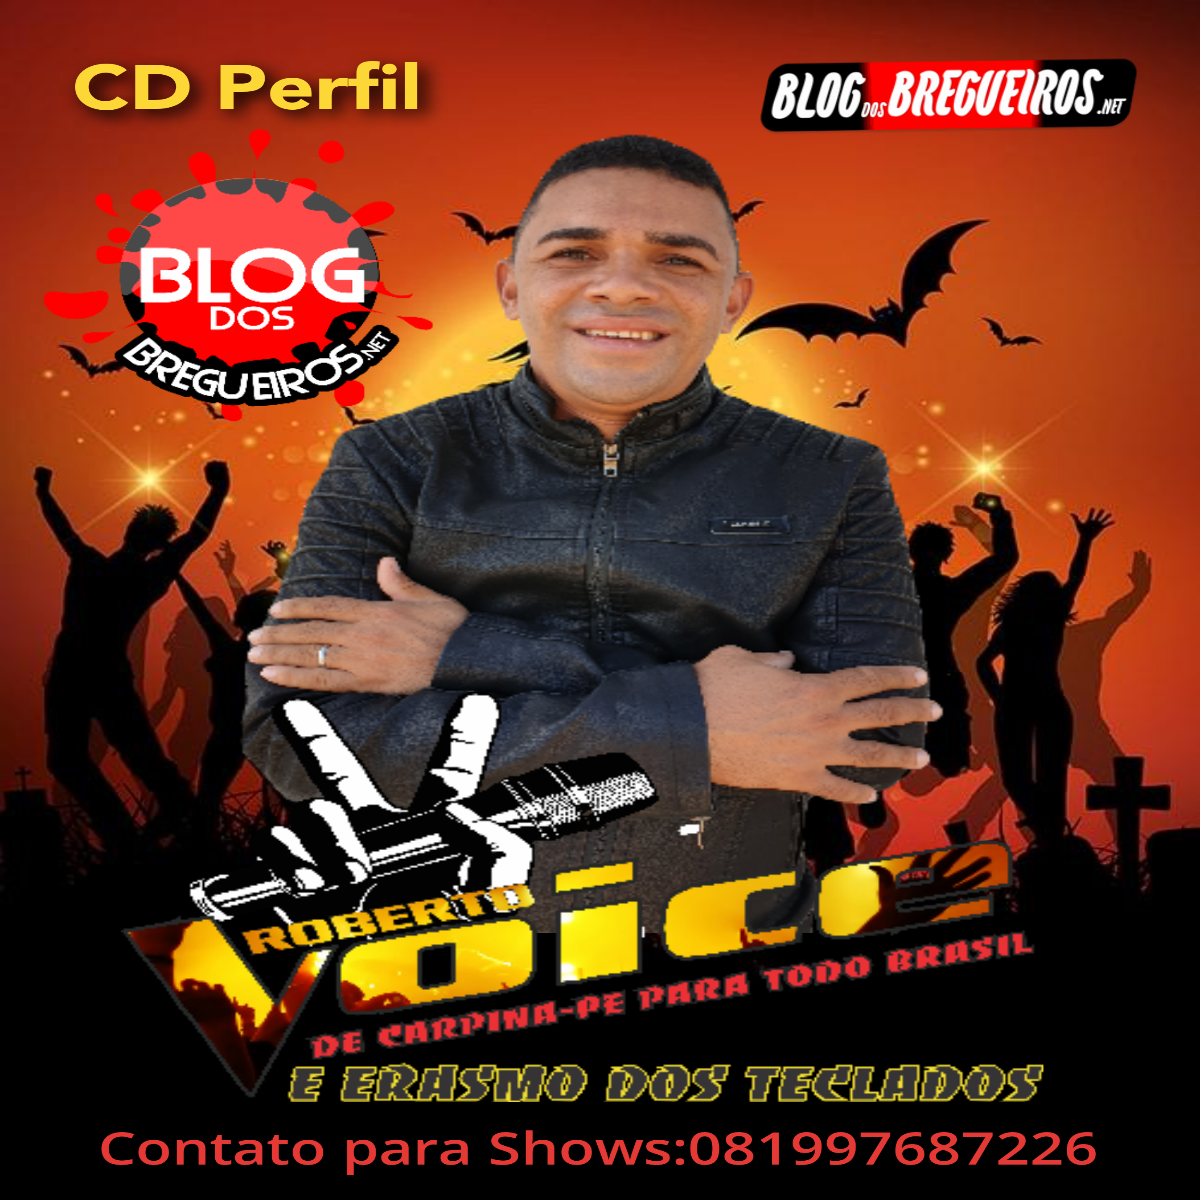 BANDA BAIXAR CARICIAS DA CD